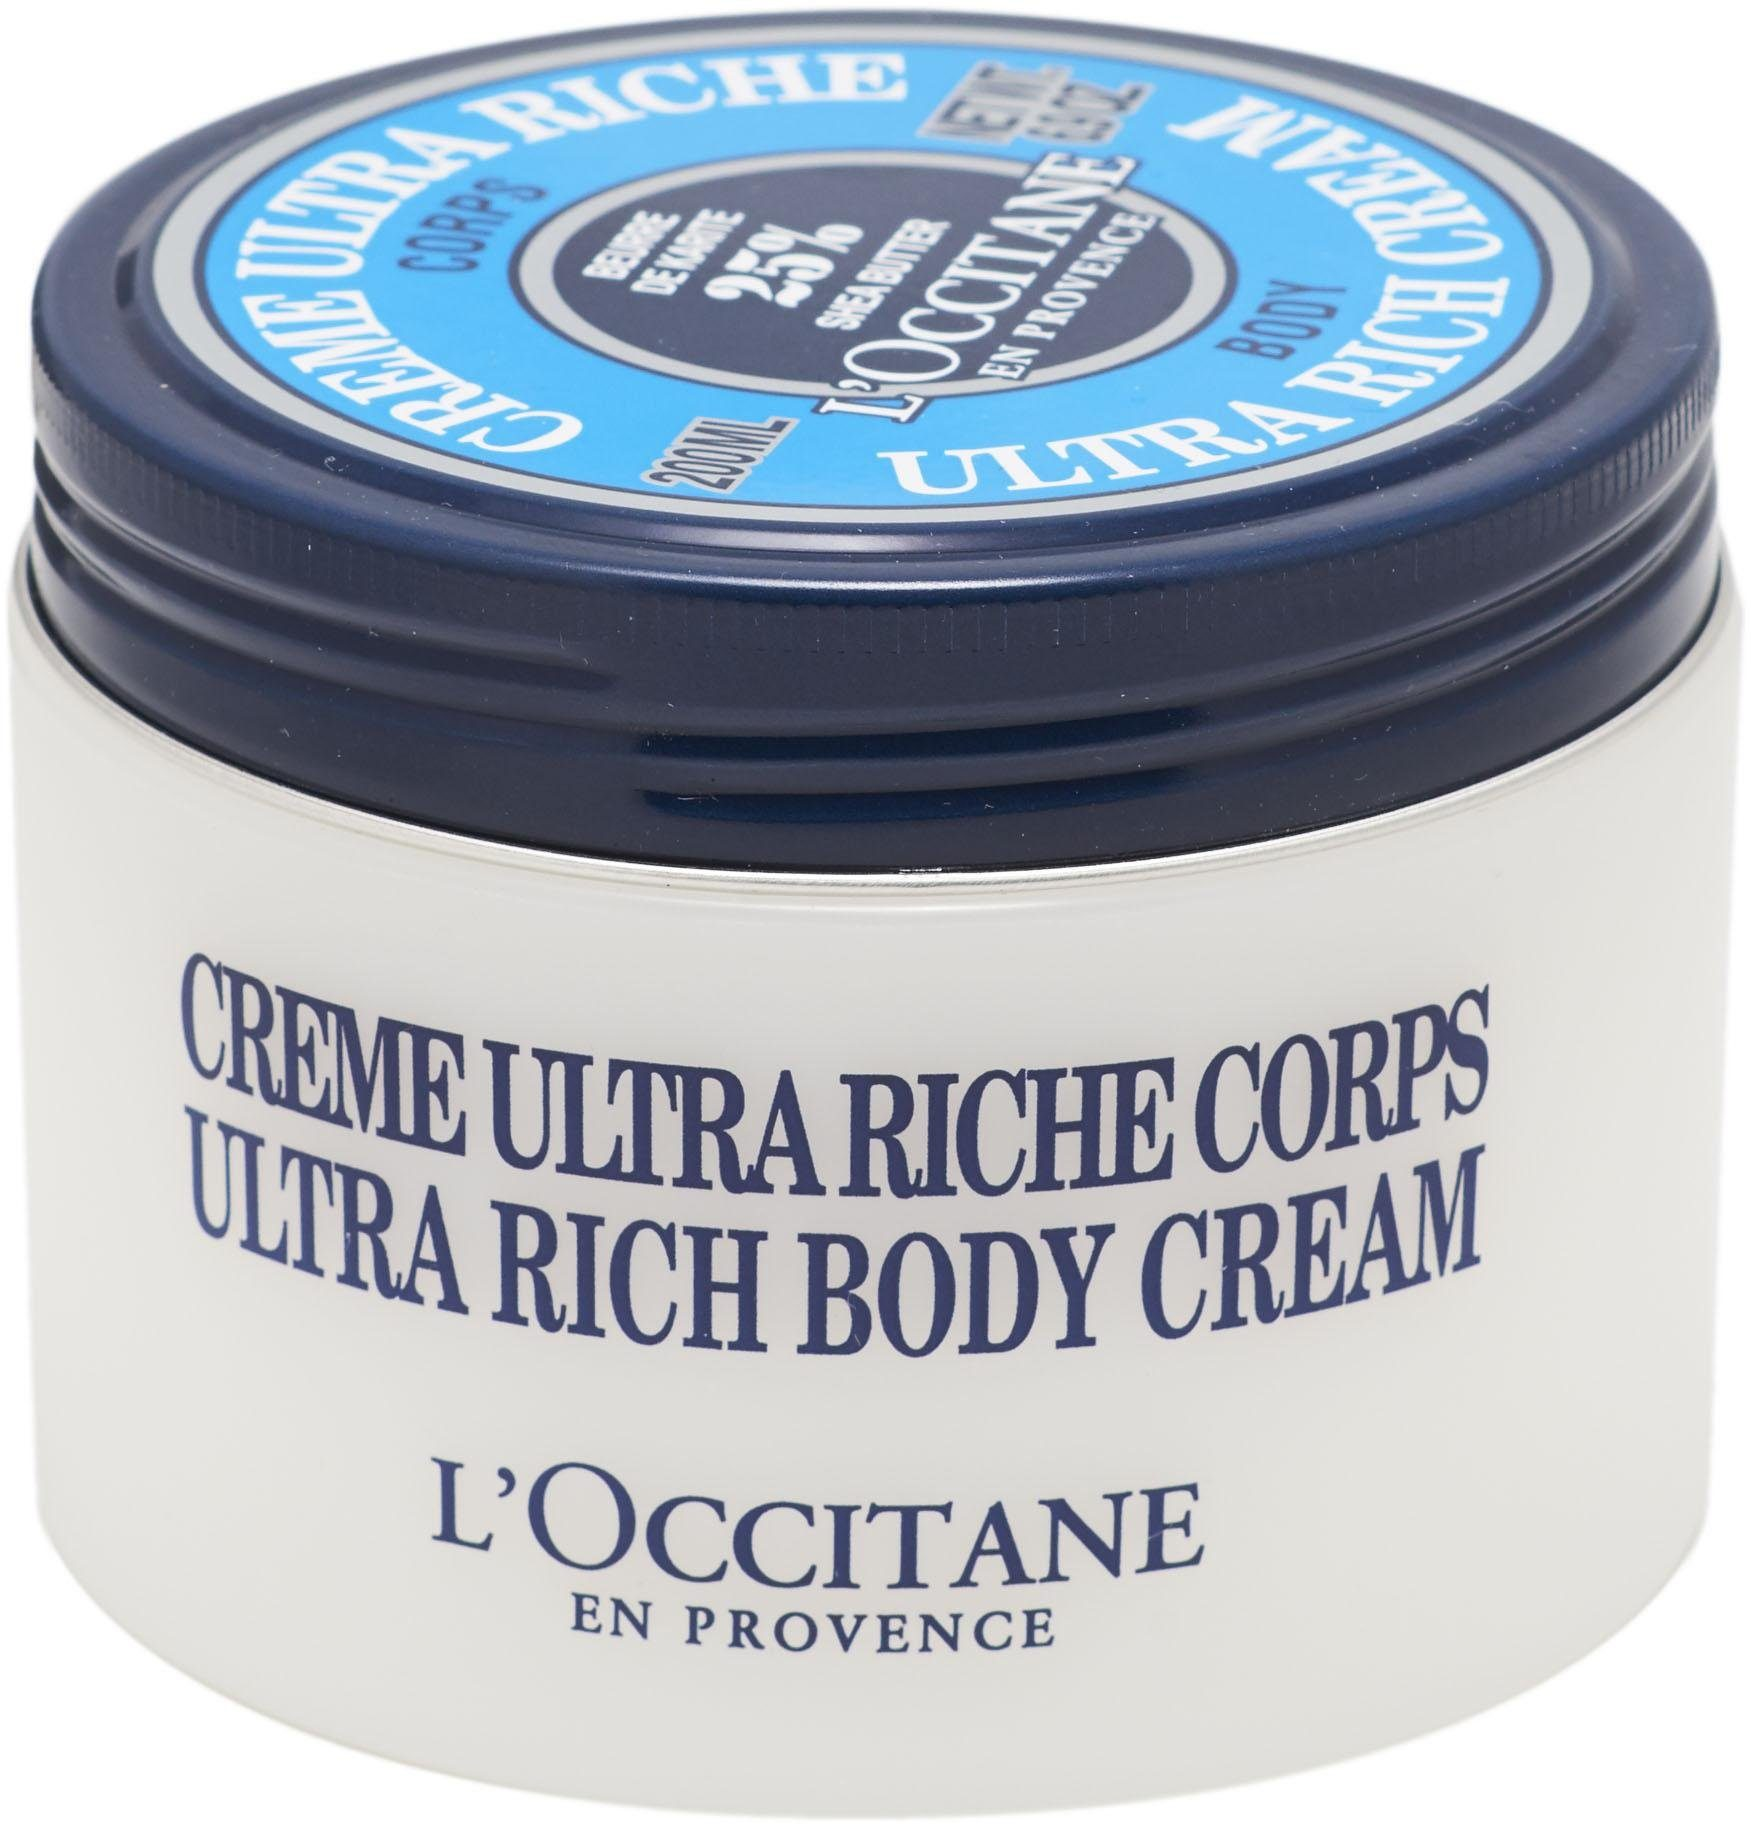 L'OCCITANE, »Karité Creme Ultra Riche Corps«, Körpercreme